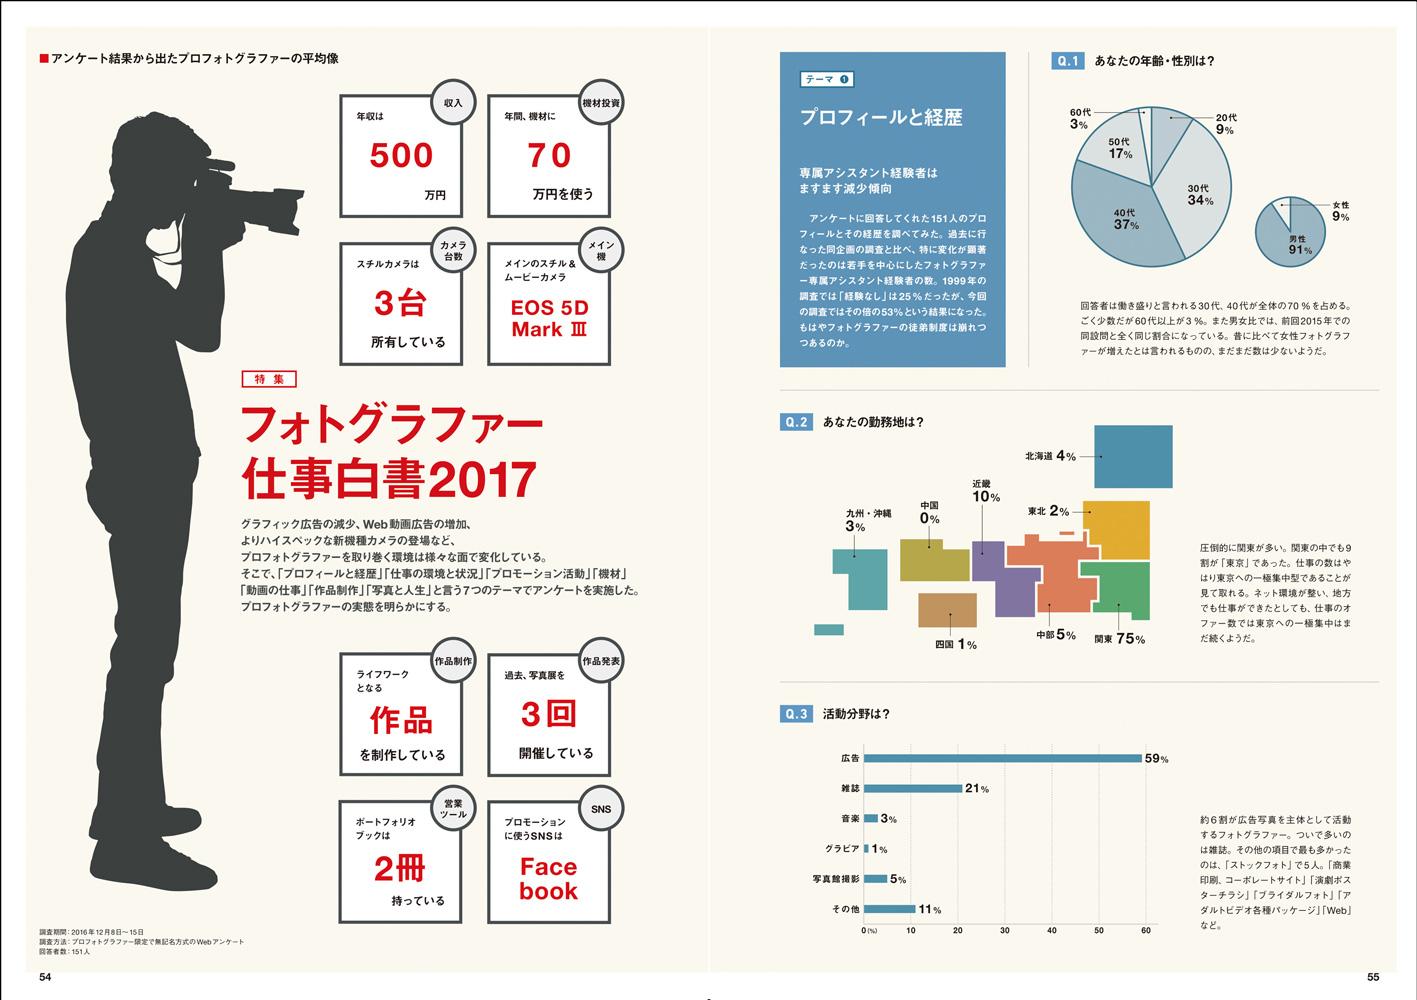 2017_CP02_特集フォトグラファーの仕事白書2017